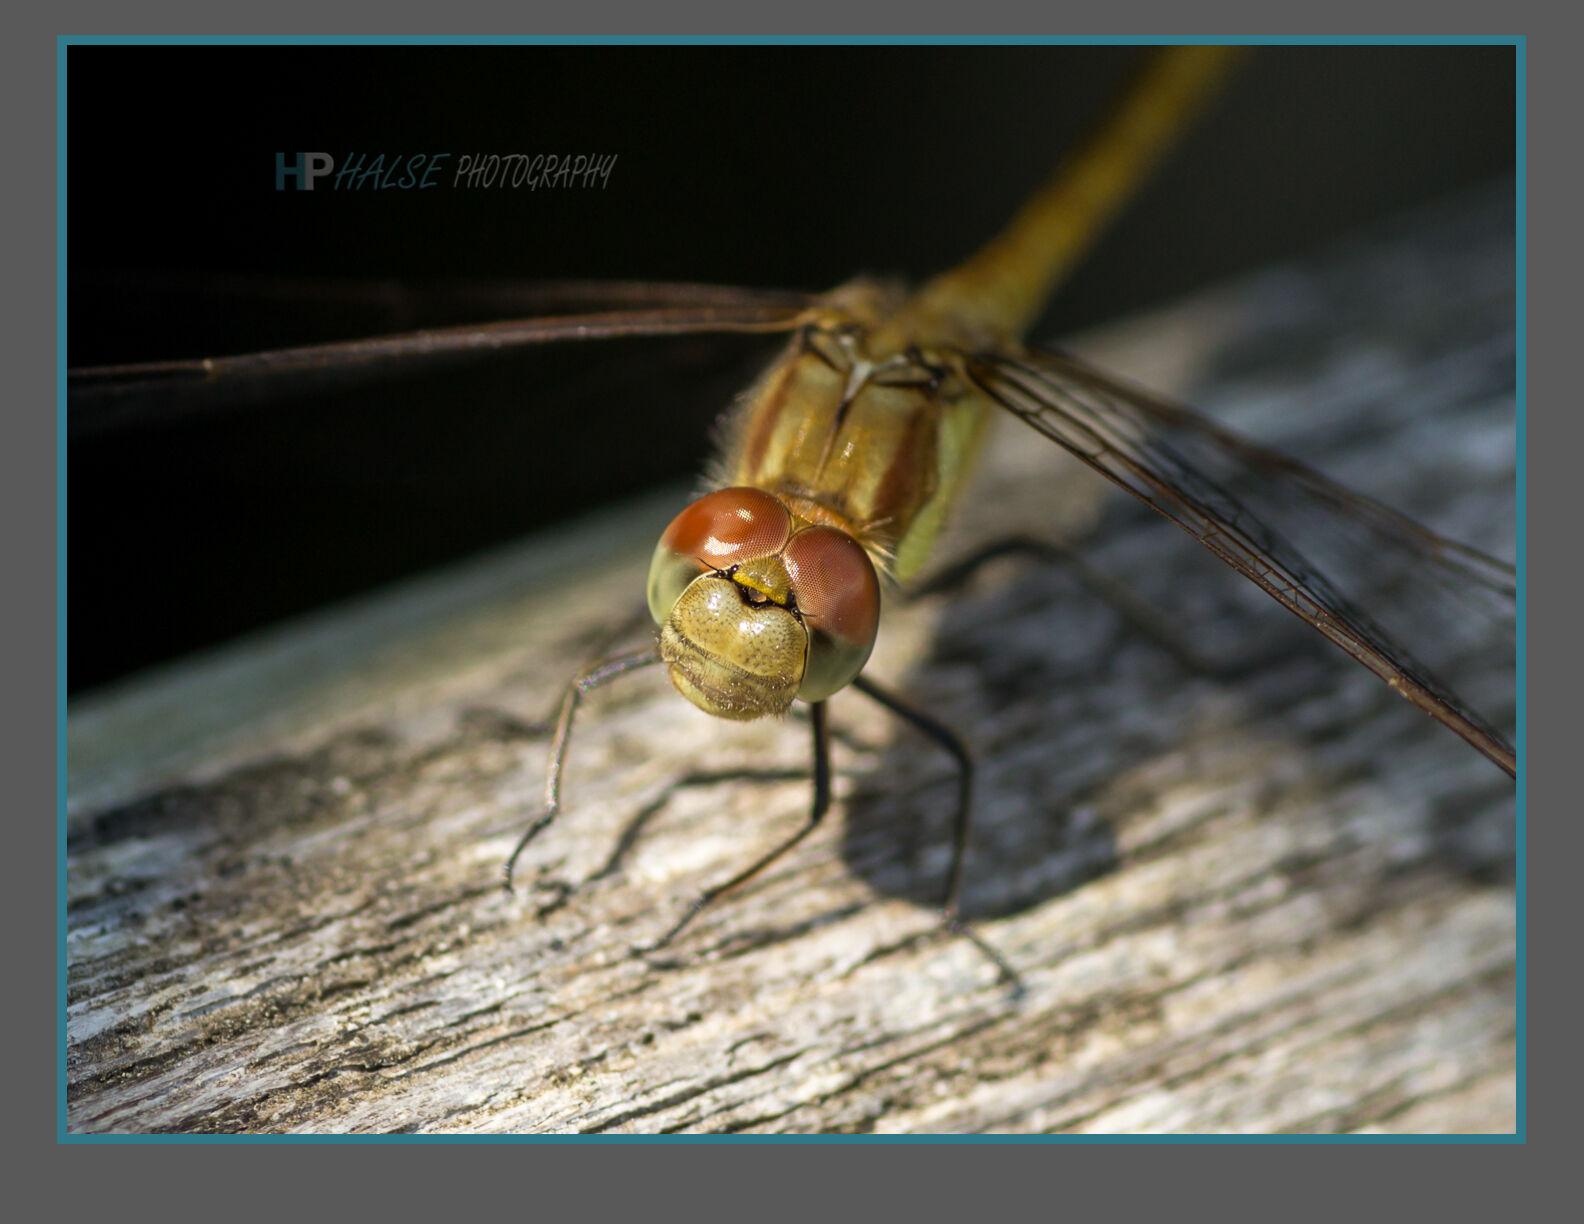 004 Dragonfly